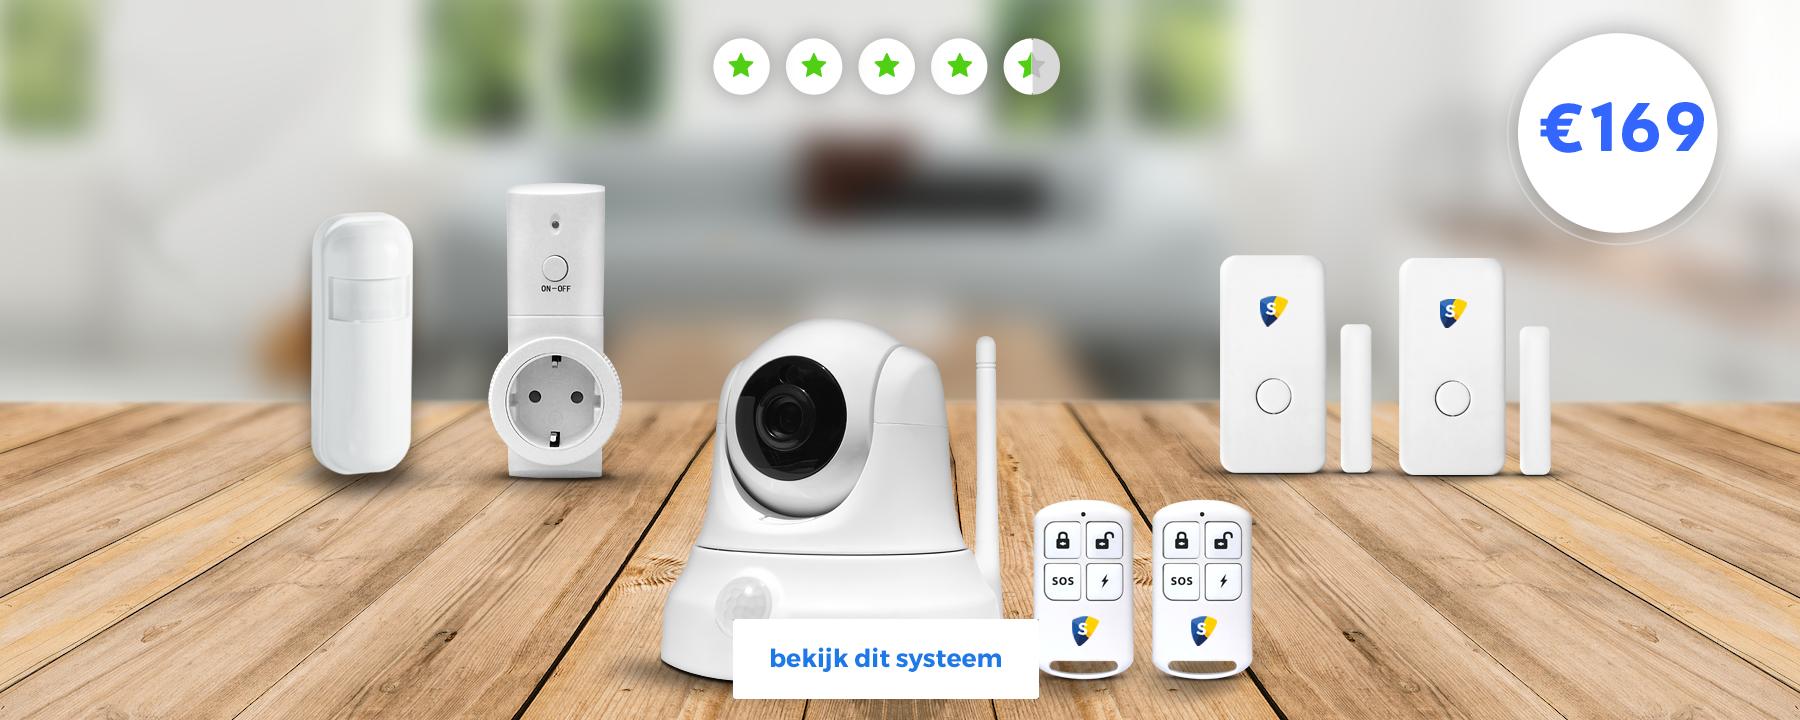 smart home beveiliging plus pakket alarm systeem